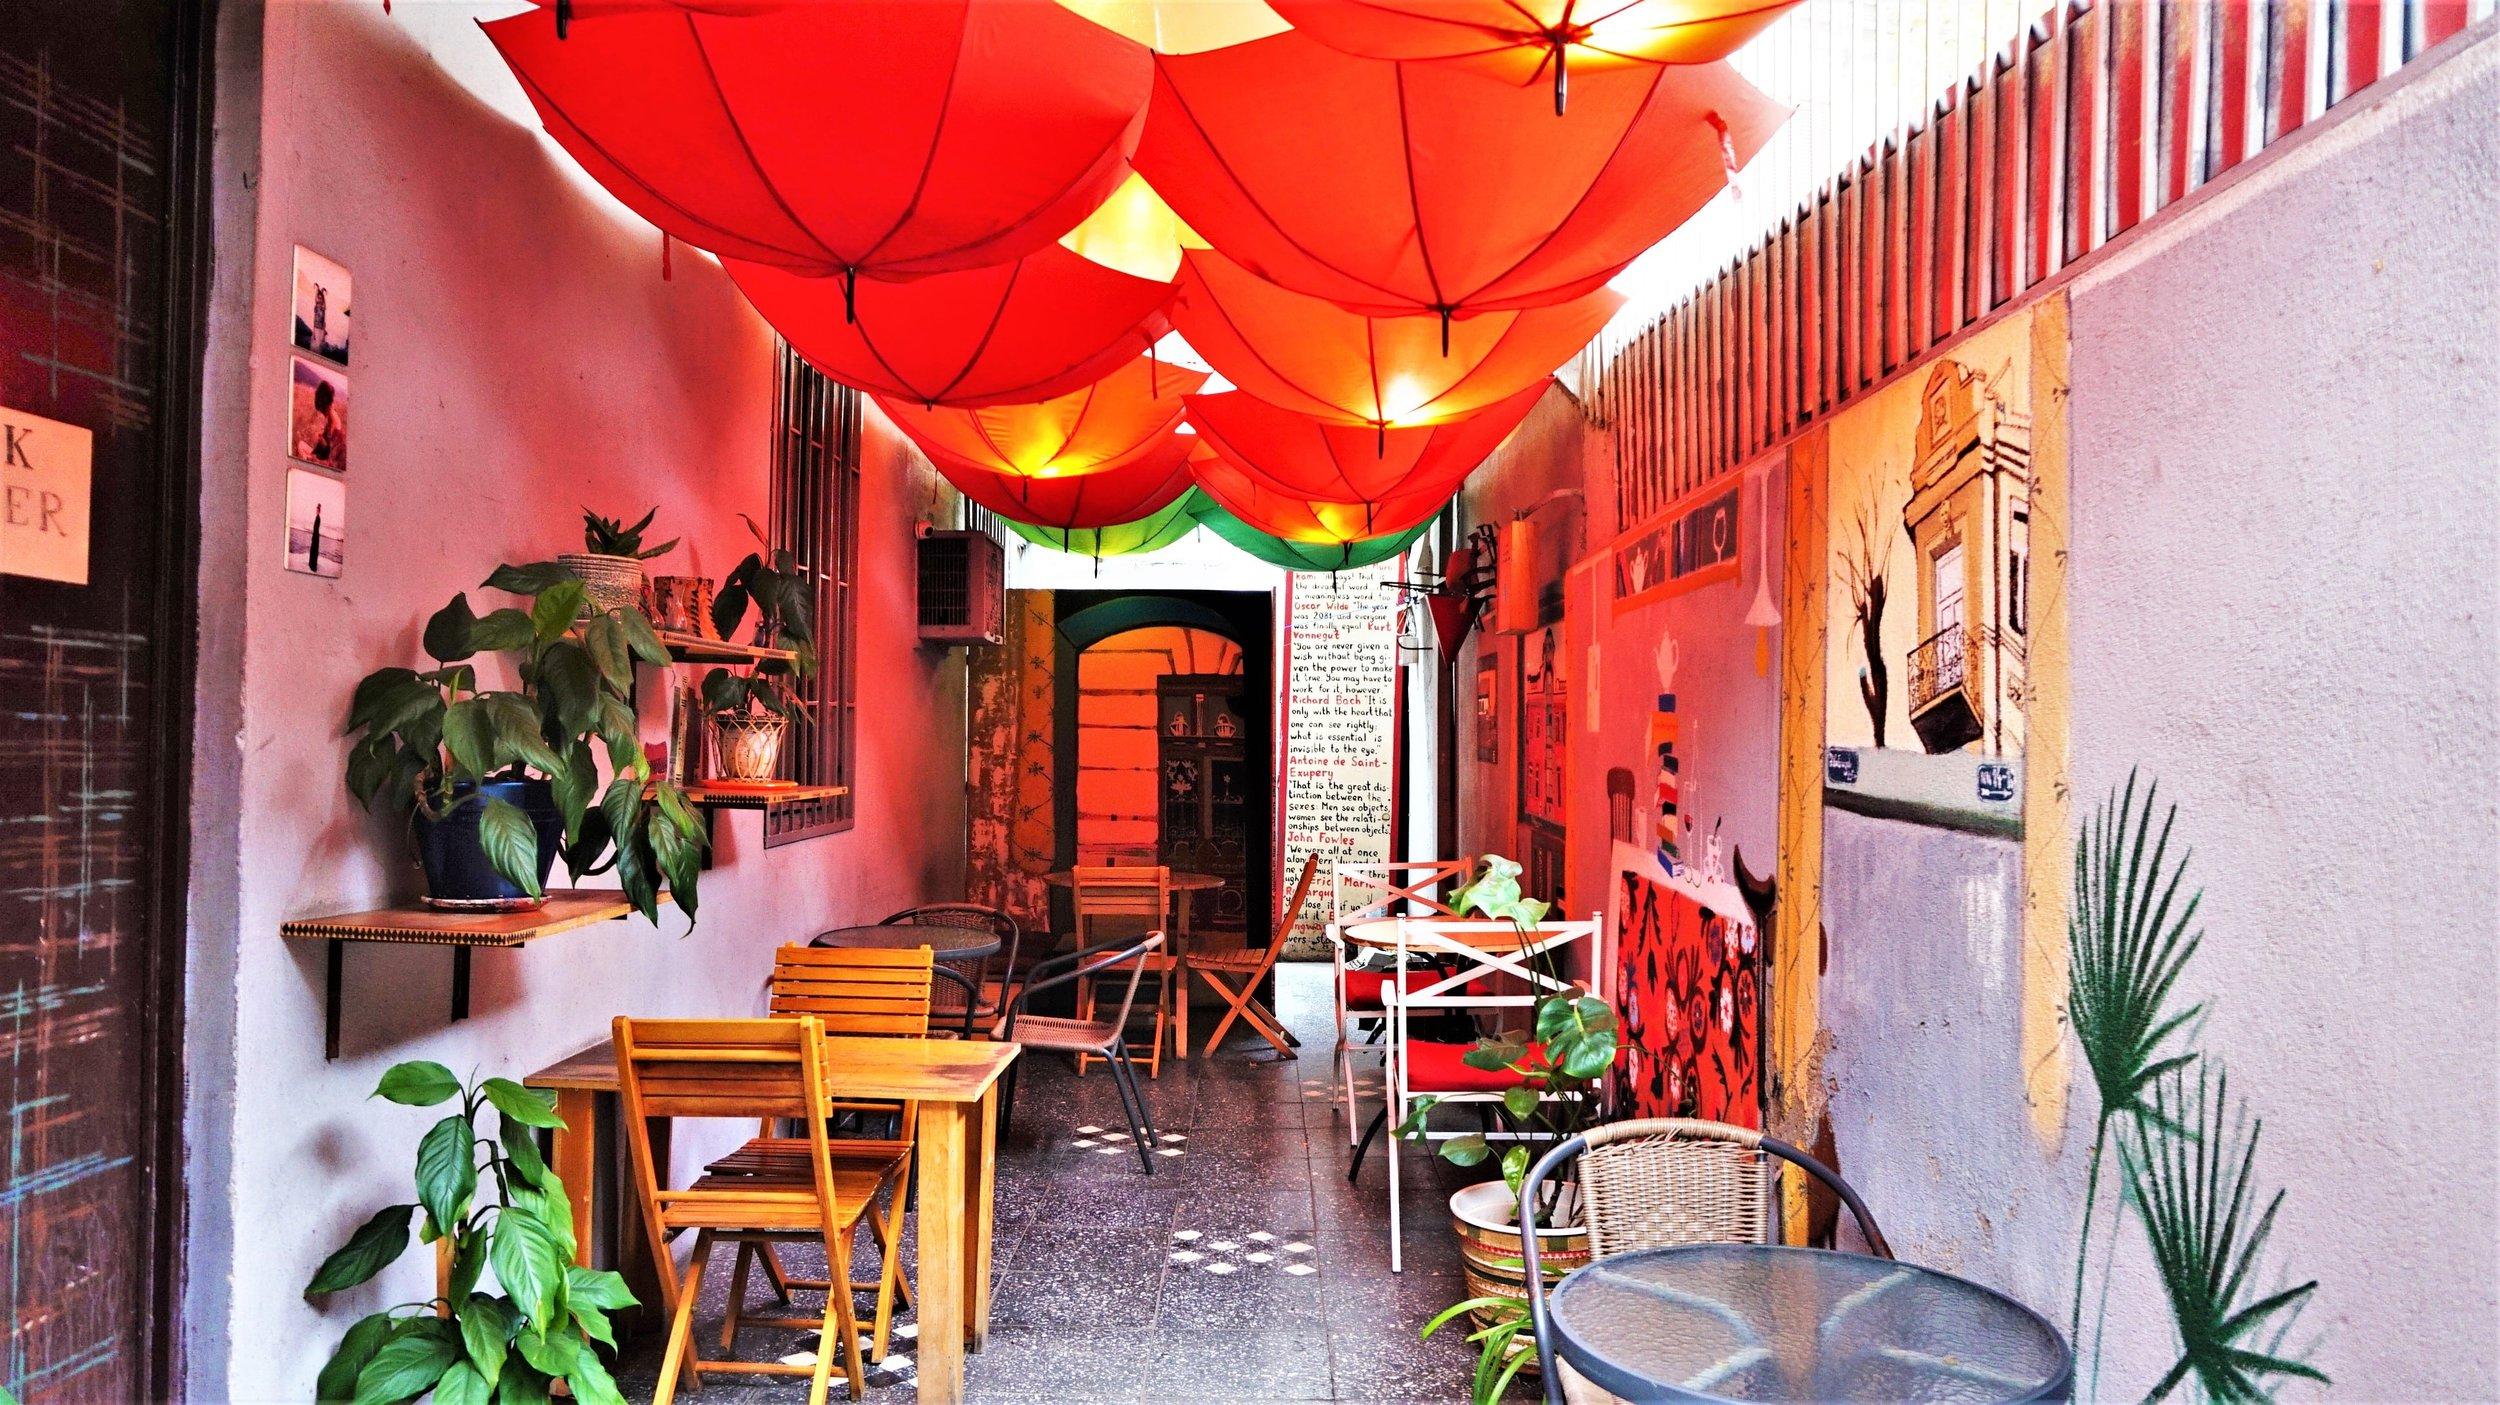 Book corner cafe tbilisi georgia